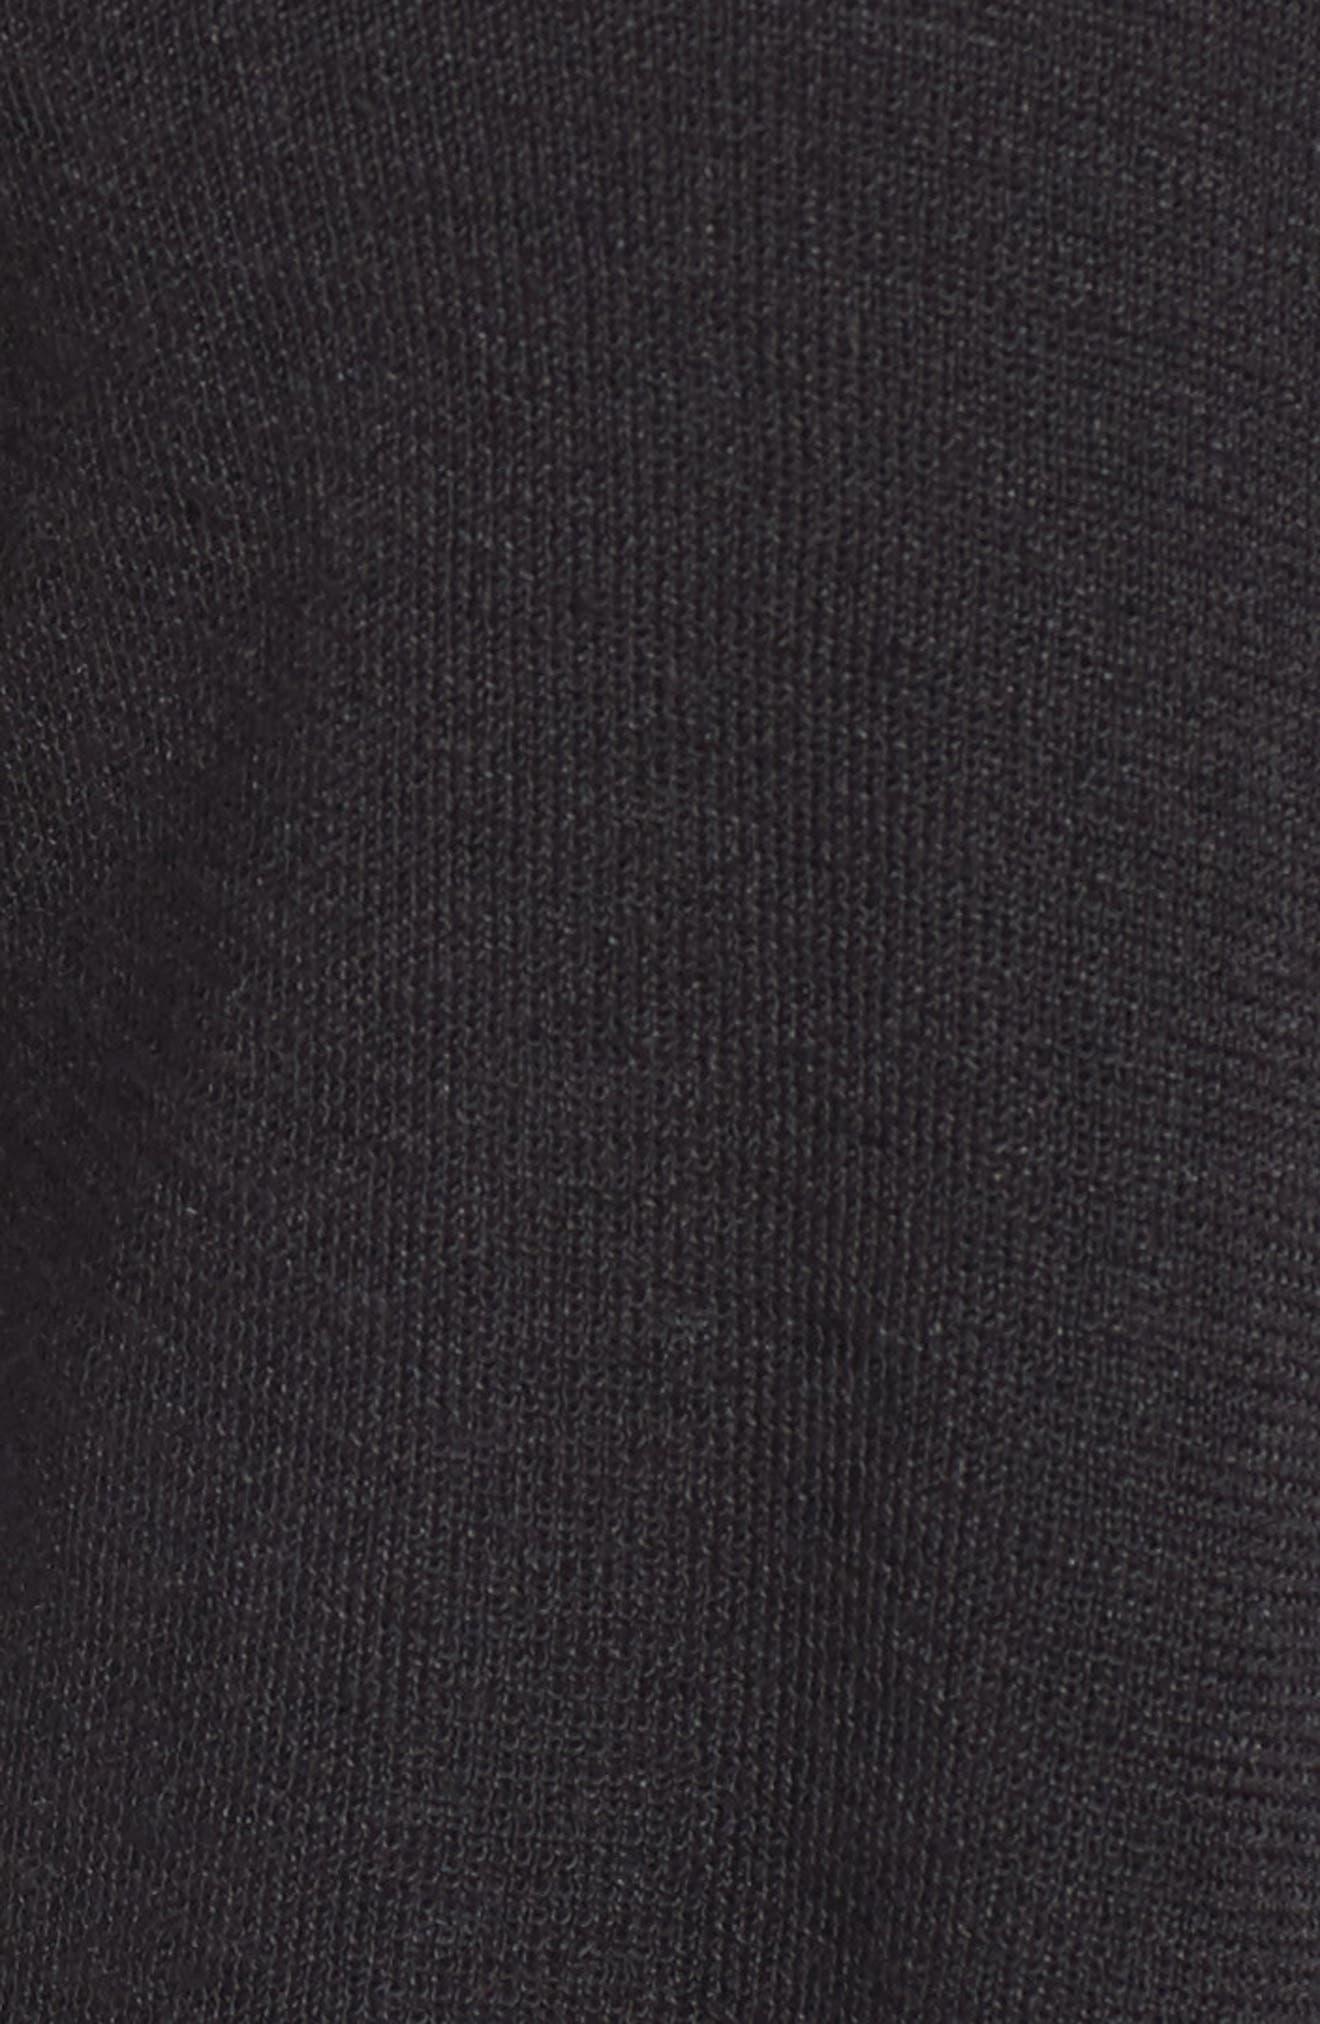 Open Blazer Cardigan,                             Alternate thumbnail 6, color,                             BLACK ONYX